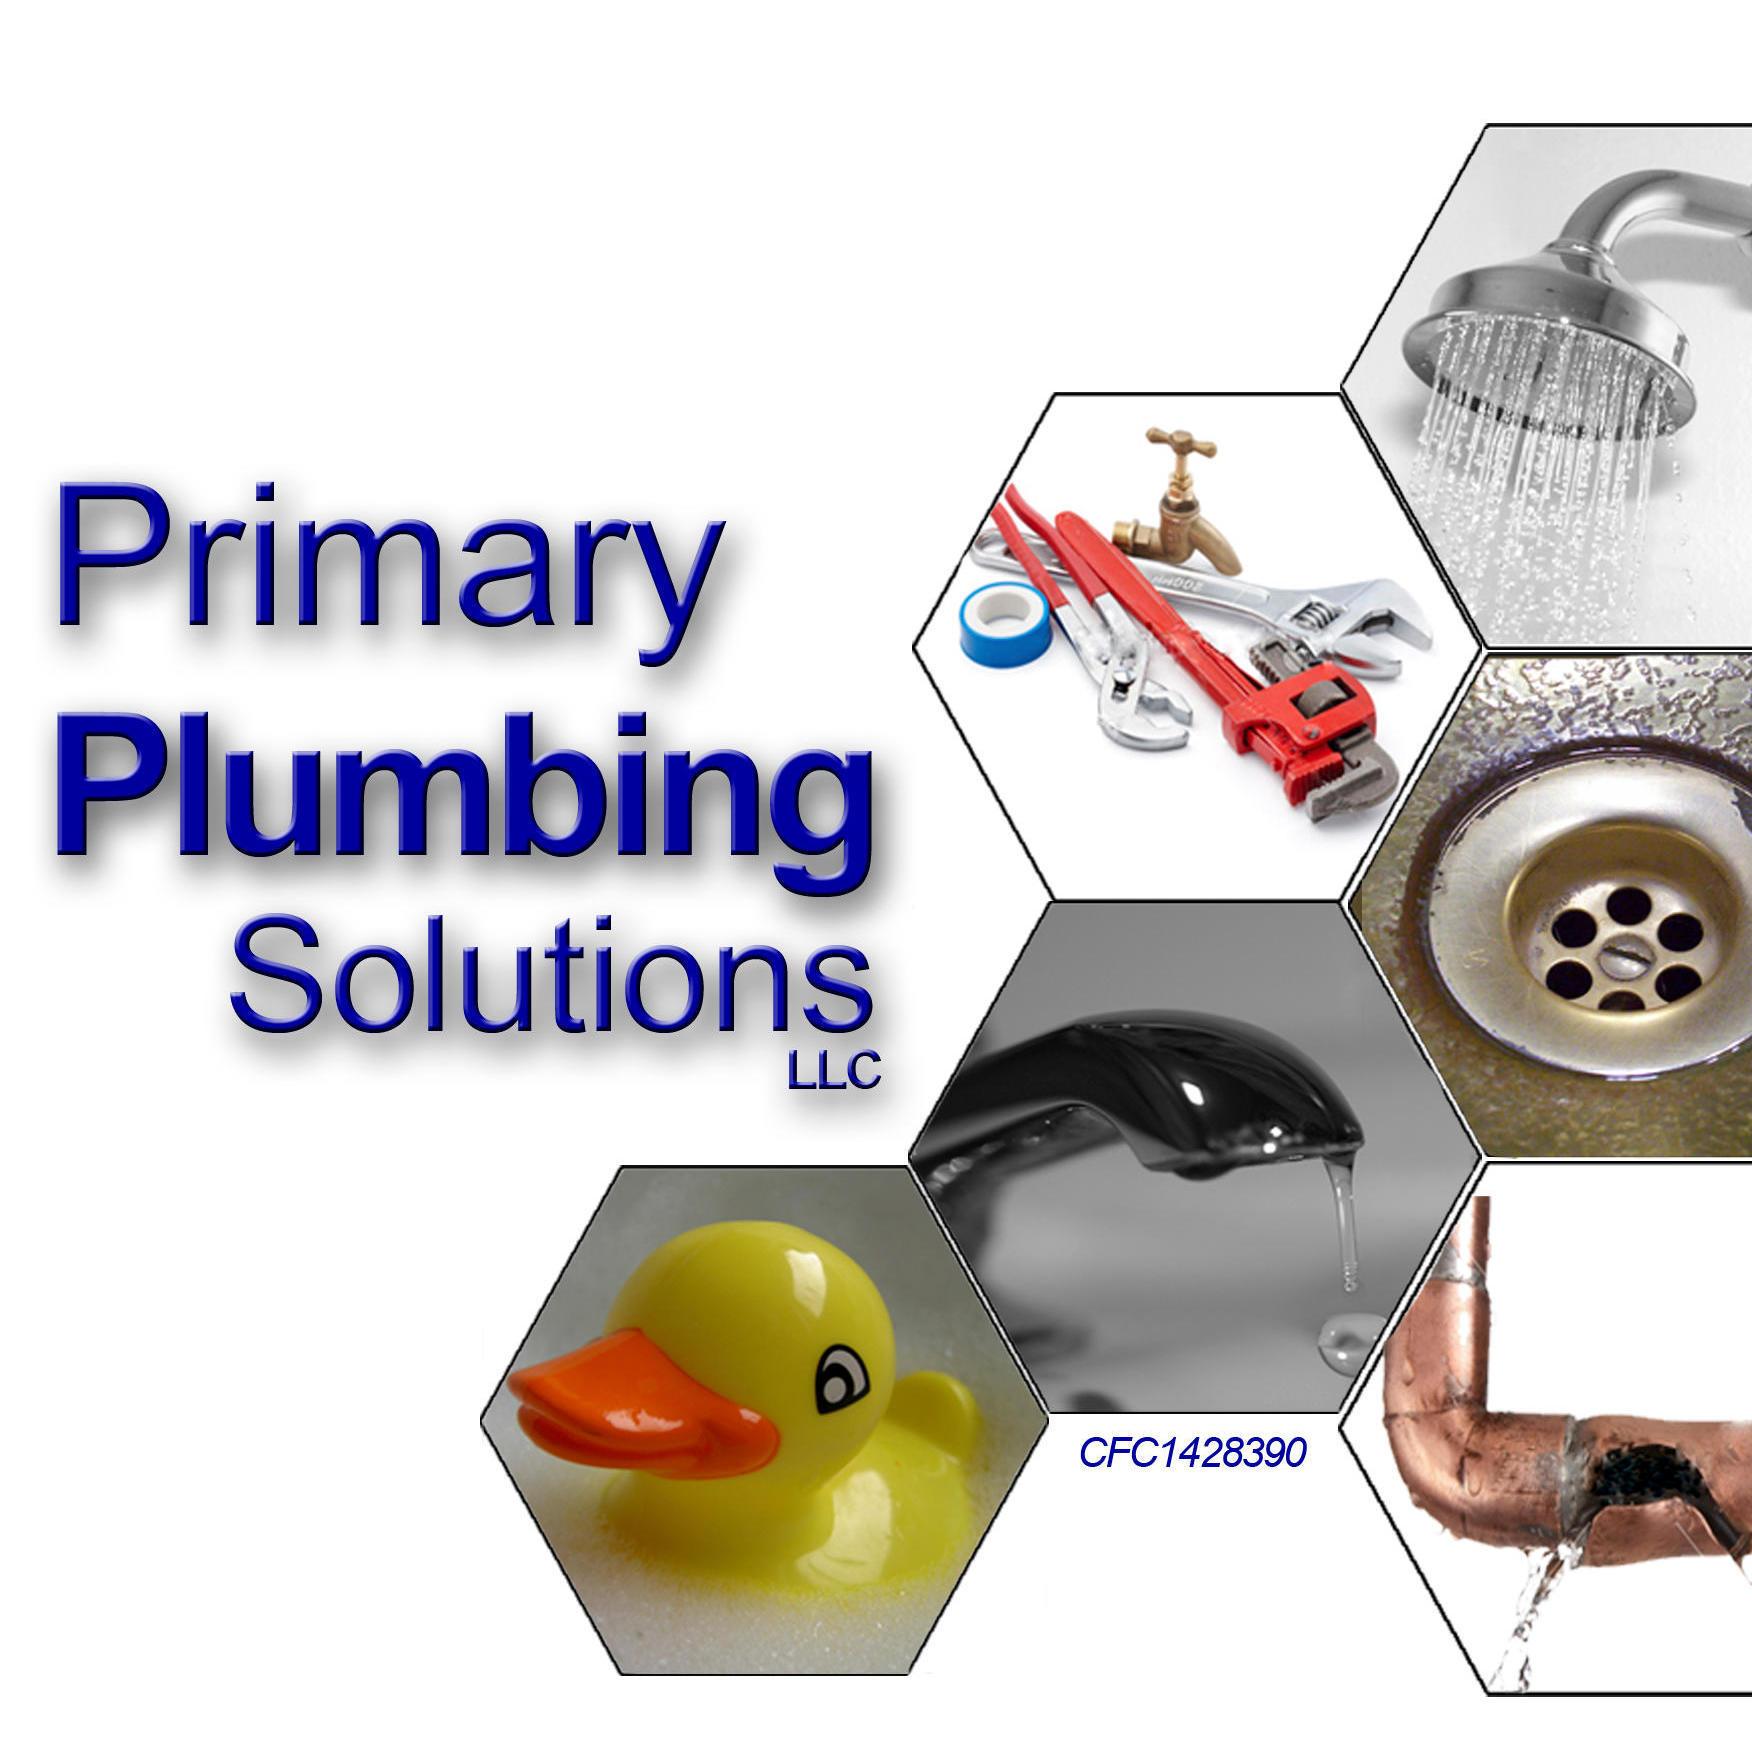 Primary Plumbing Solutions, LLC